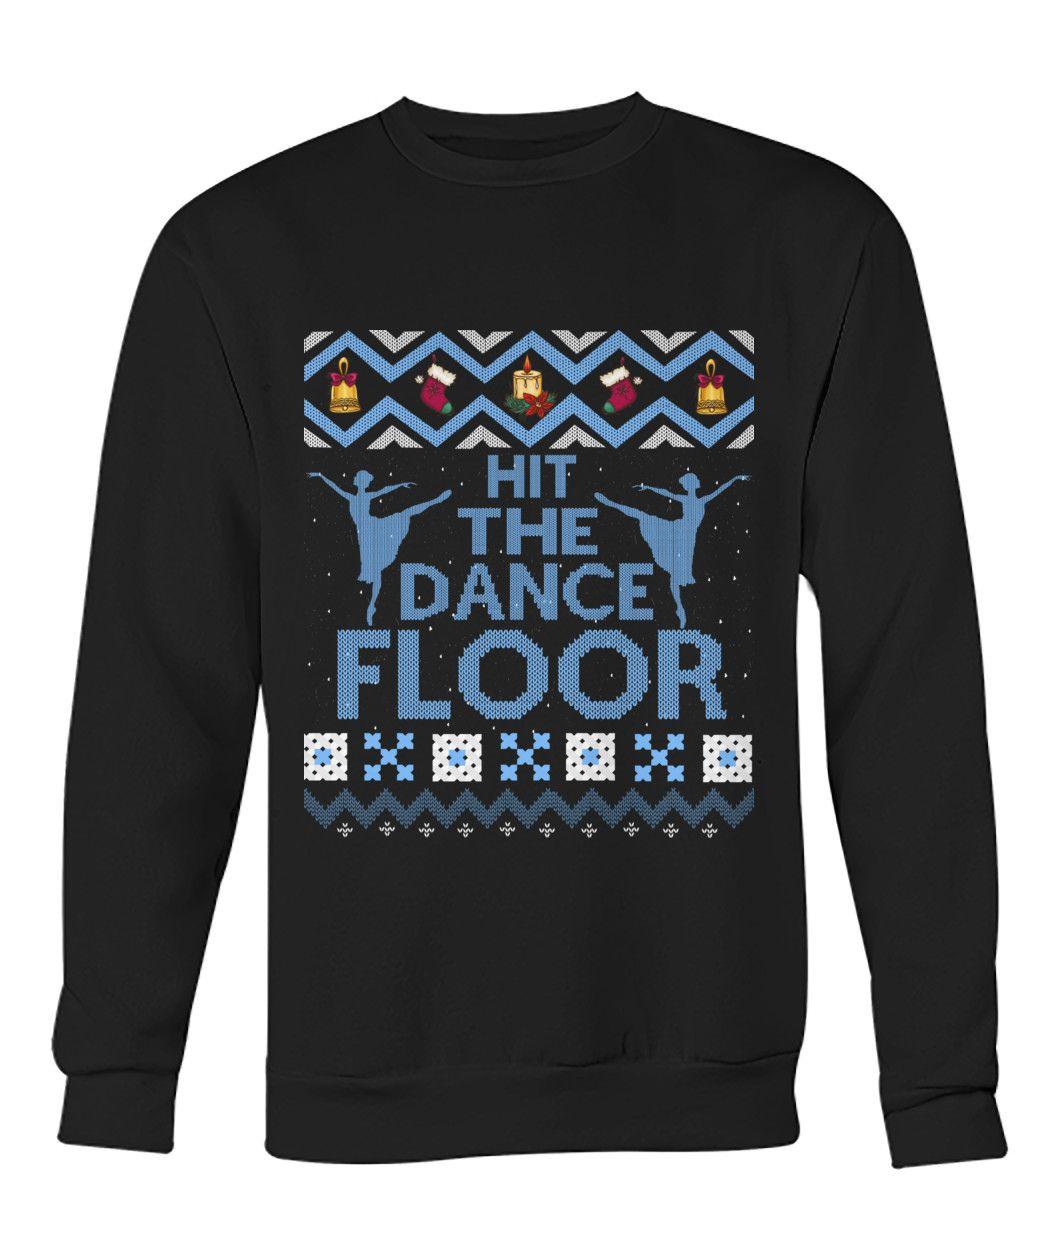 Pin on Ugly Christmas Sweater 2018